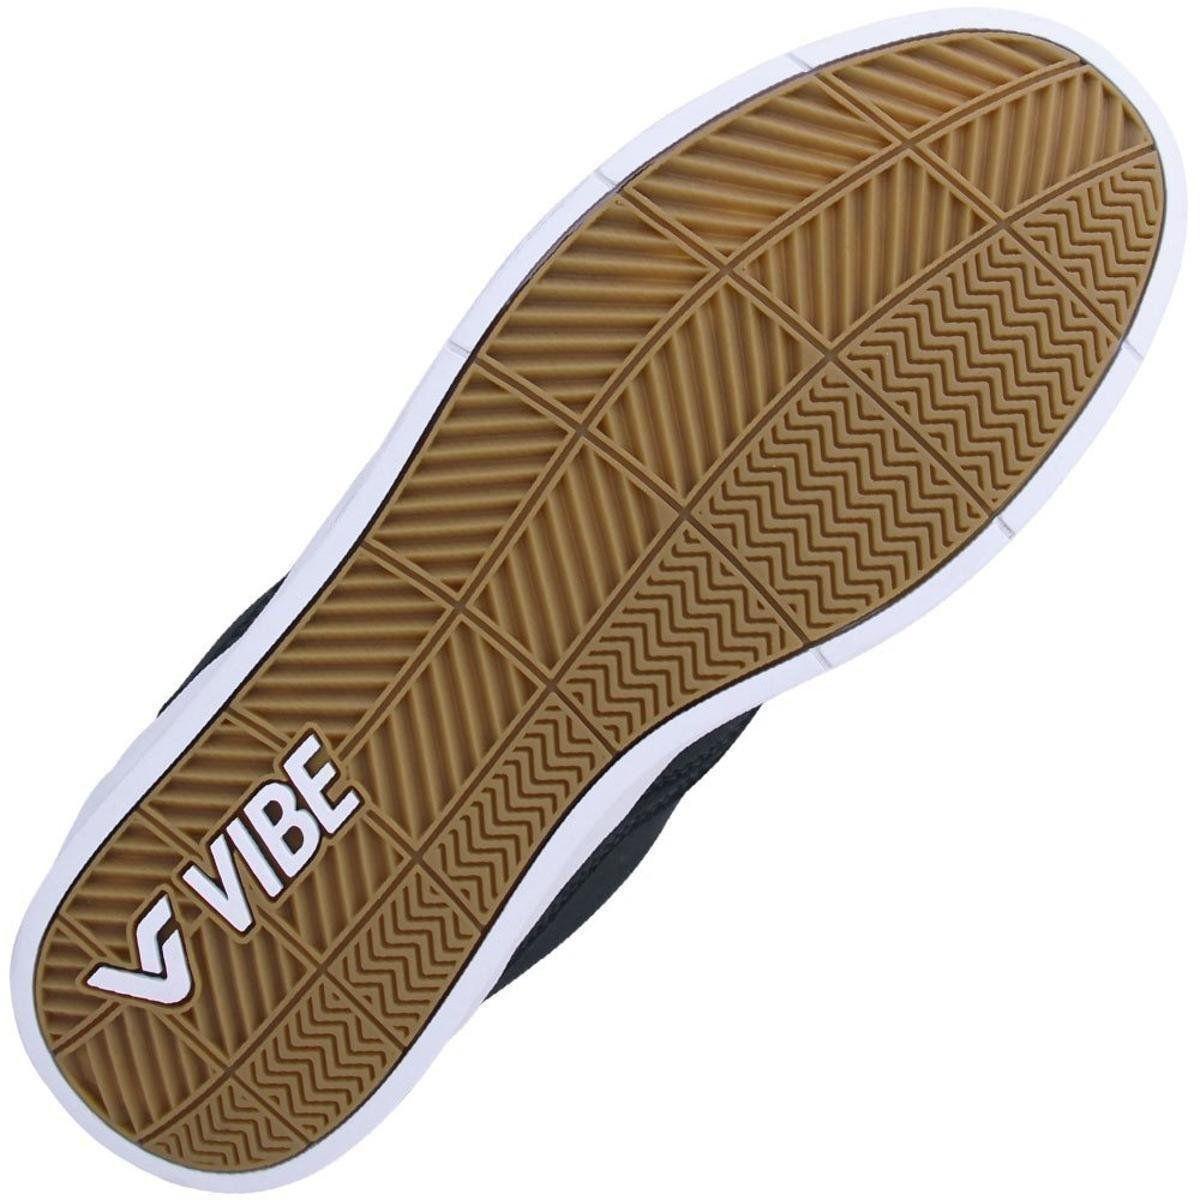 Tênis Vibe Team Edition Wilton Souza Chumbo